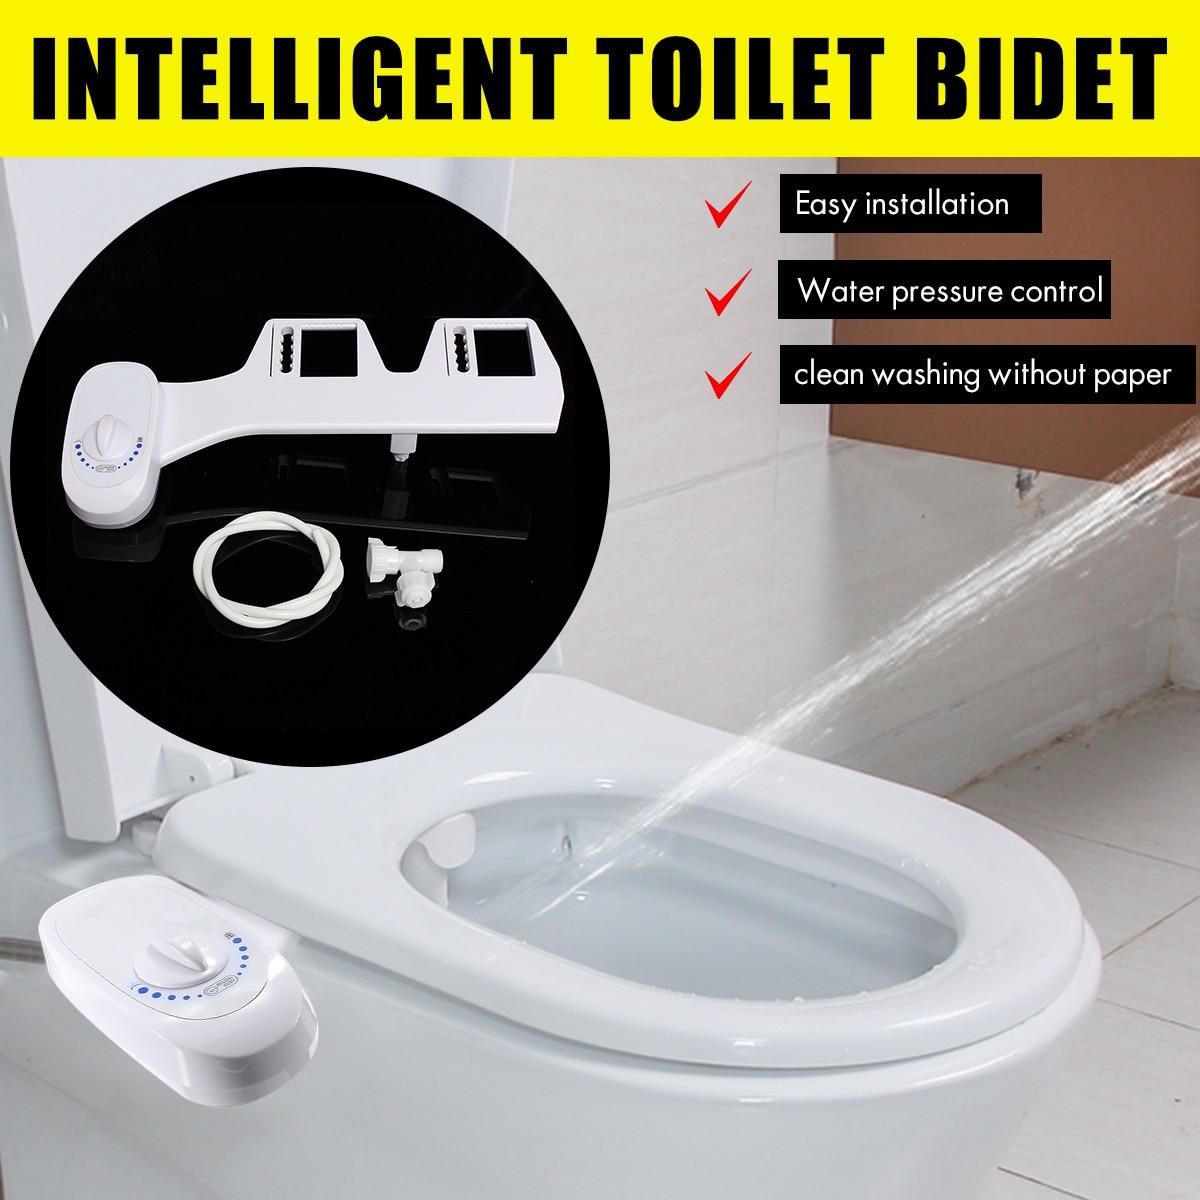 Xueqin Single Nozzle Bathroom Toilet Seat Bidet Sprayer Cold Water Non Electric Toilet Sprayer Nozzle Sprinkle  1/2  15/16Bidets   -